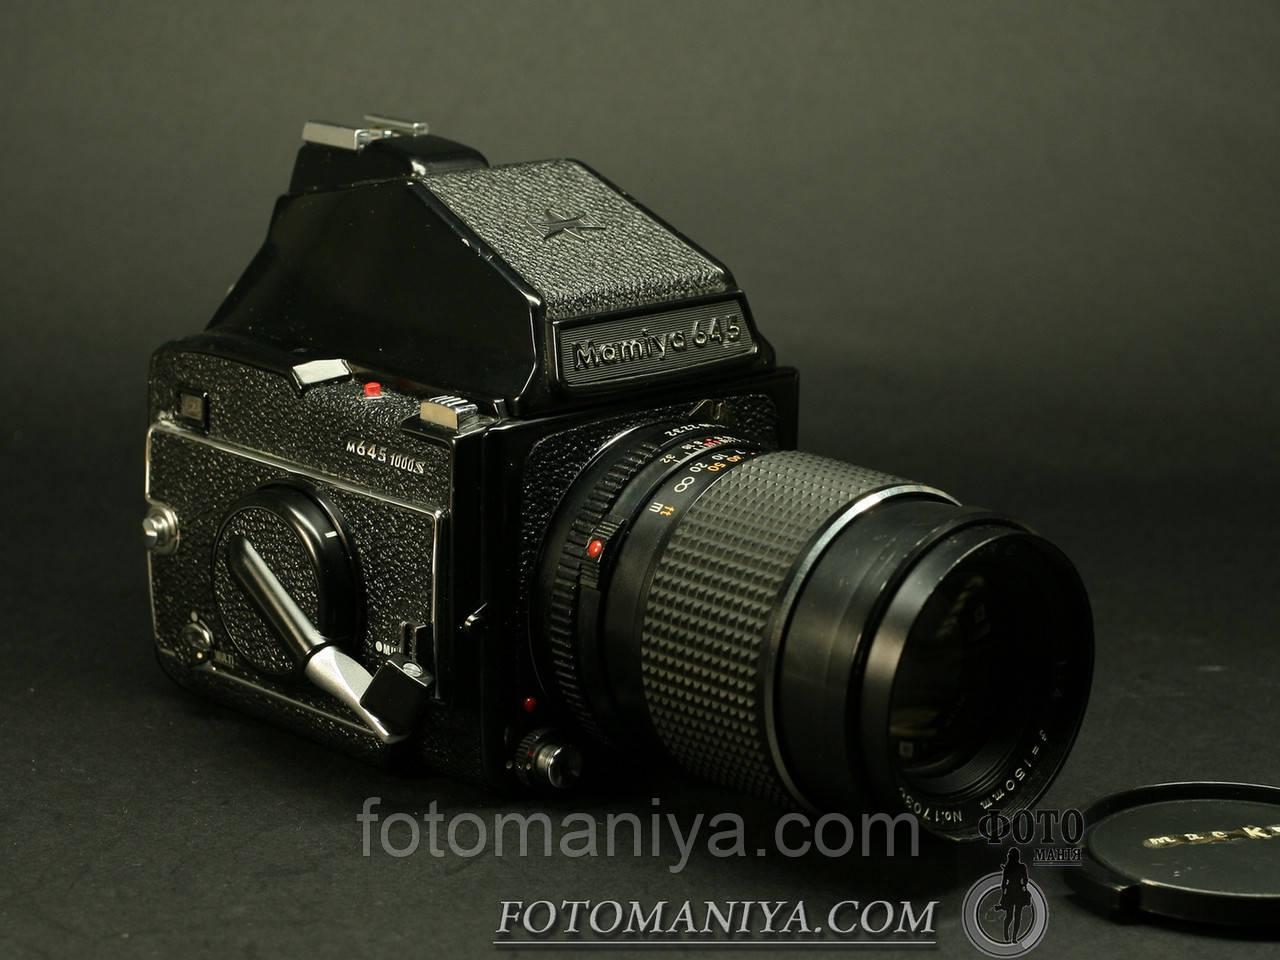 Mamiya M645 1000s kit Mamiya-Sekor C 150mm f4